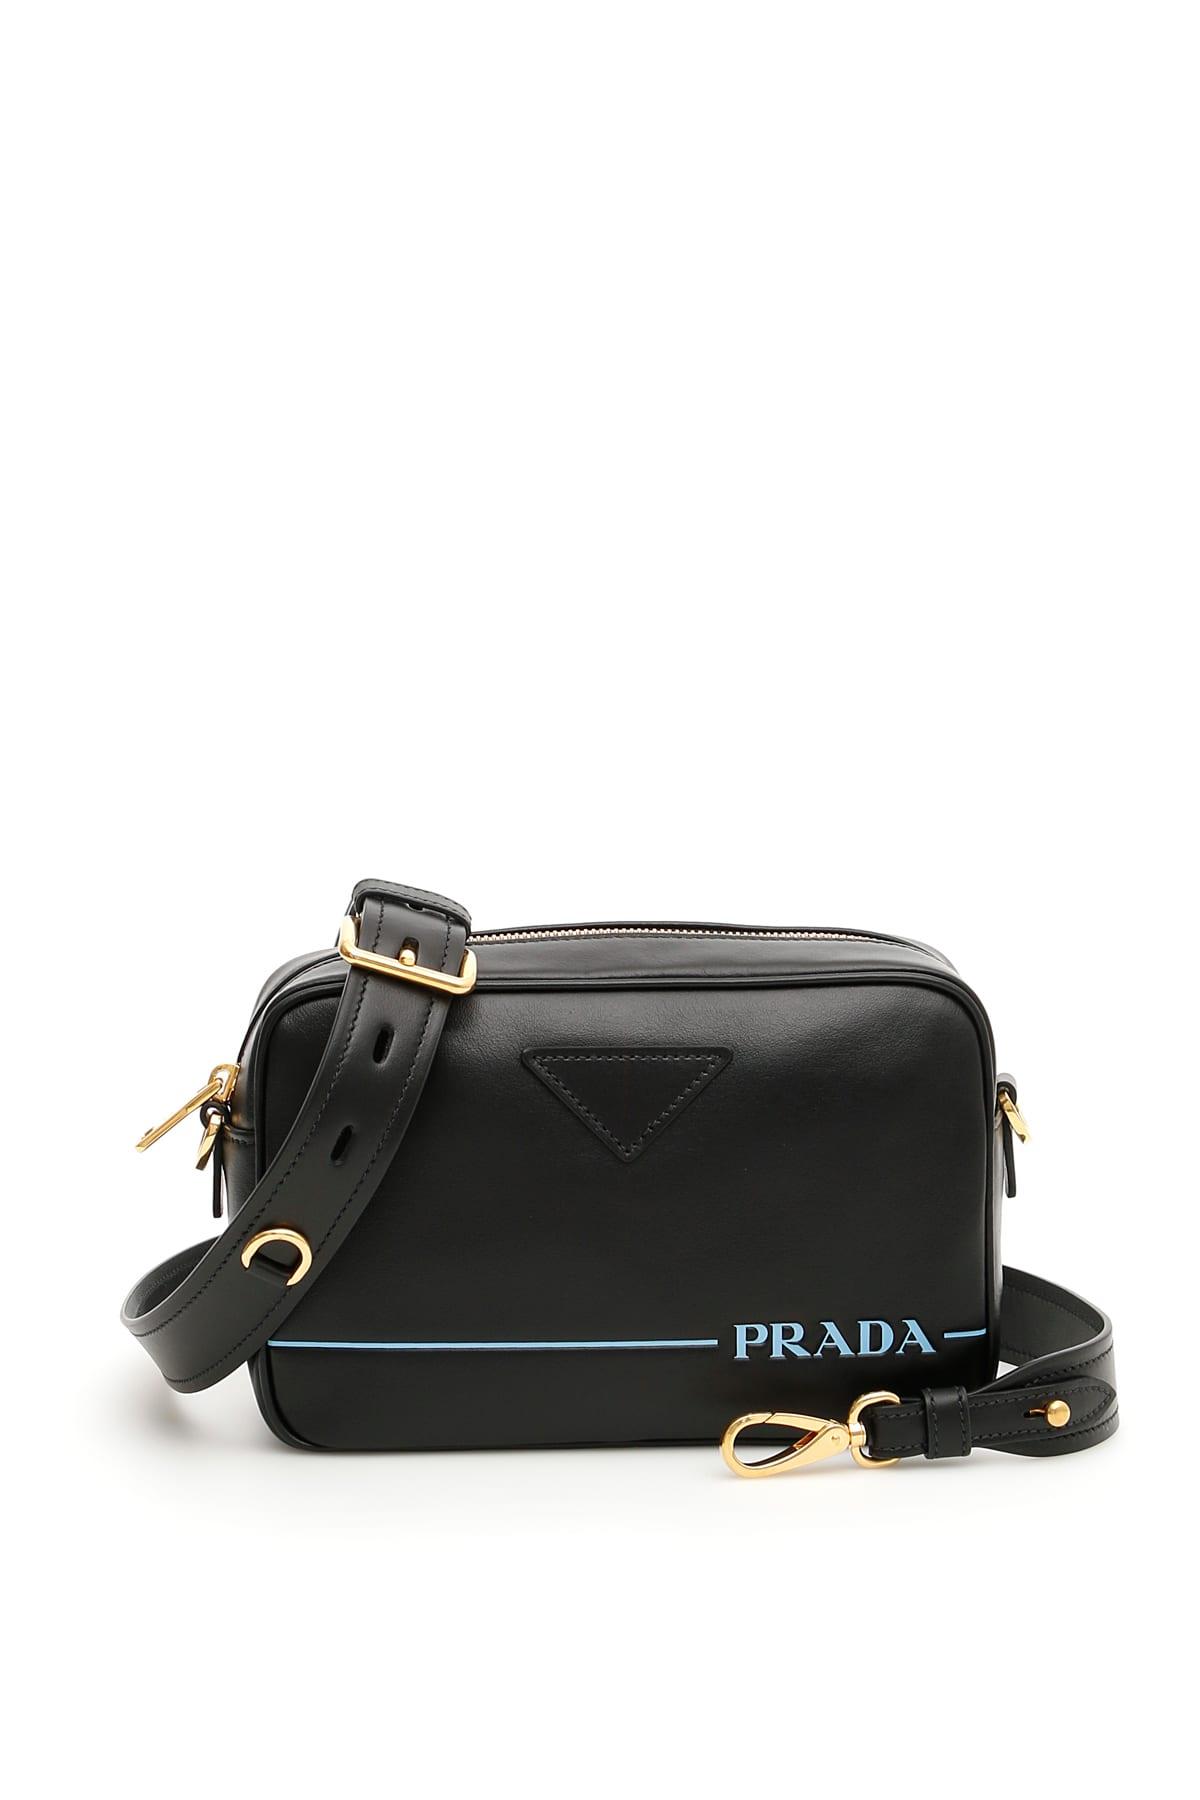 Prada Mirage Camera Bag